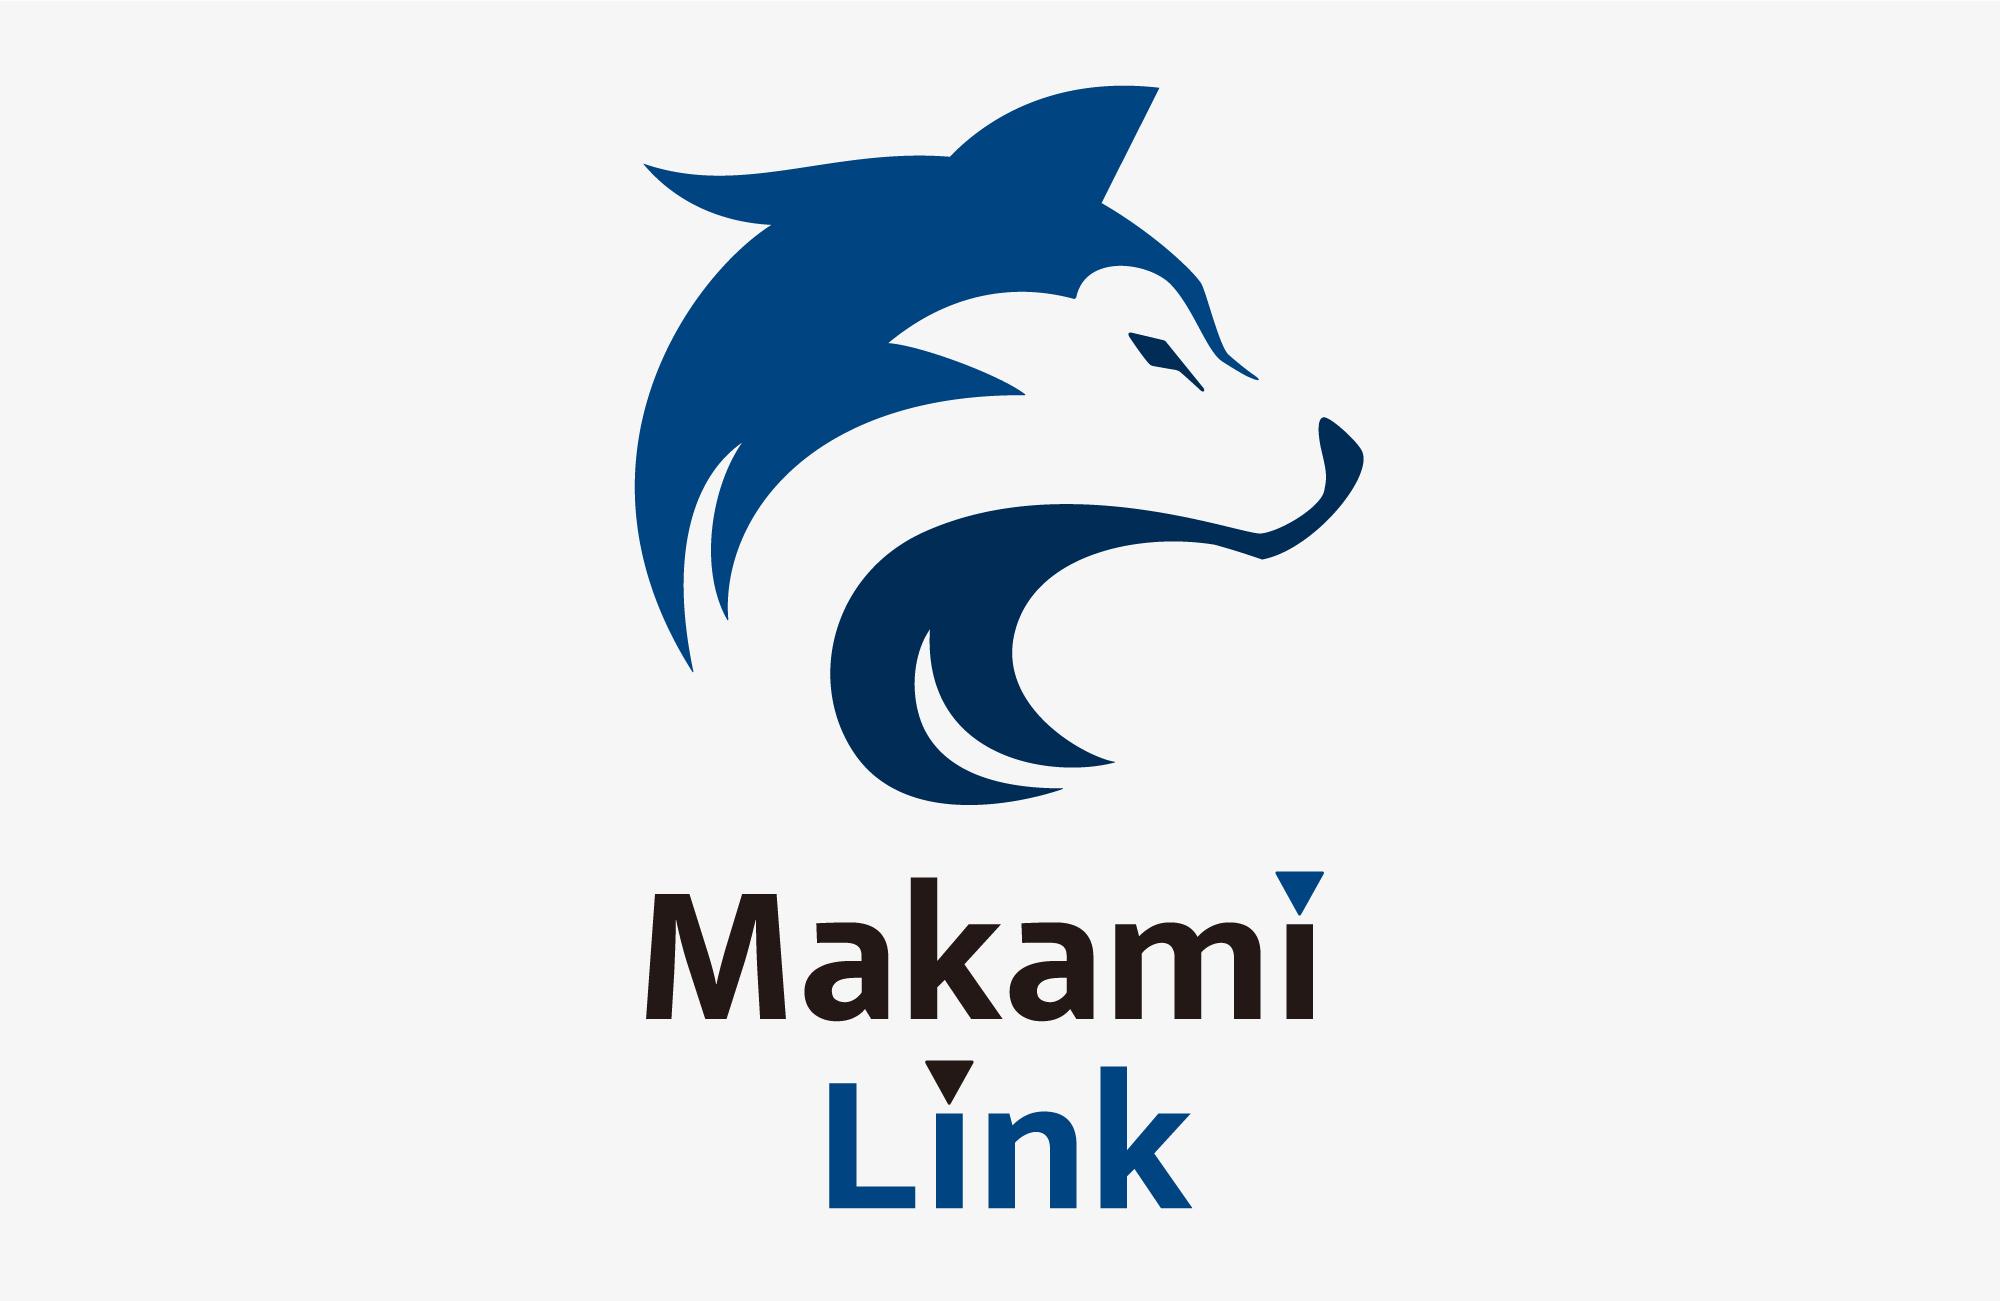 Makami Linkロゴマーク